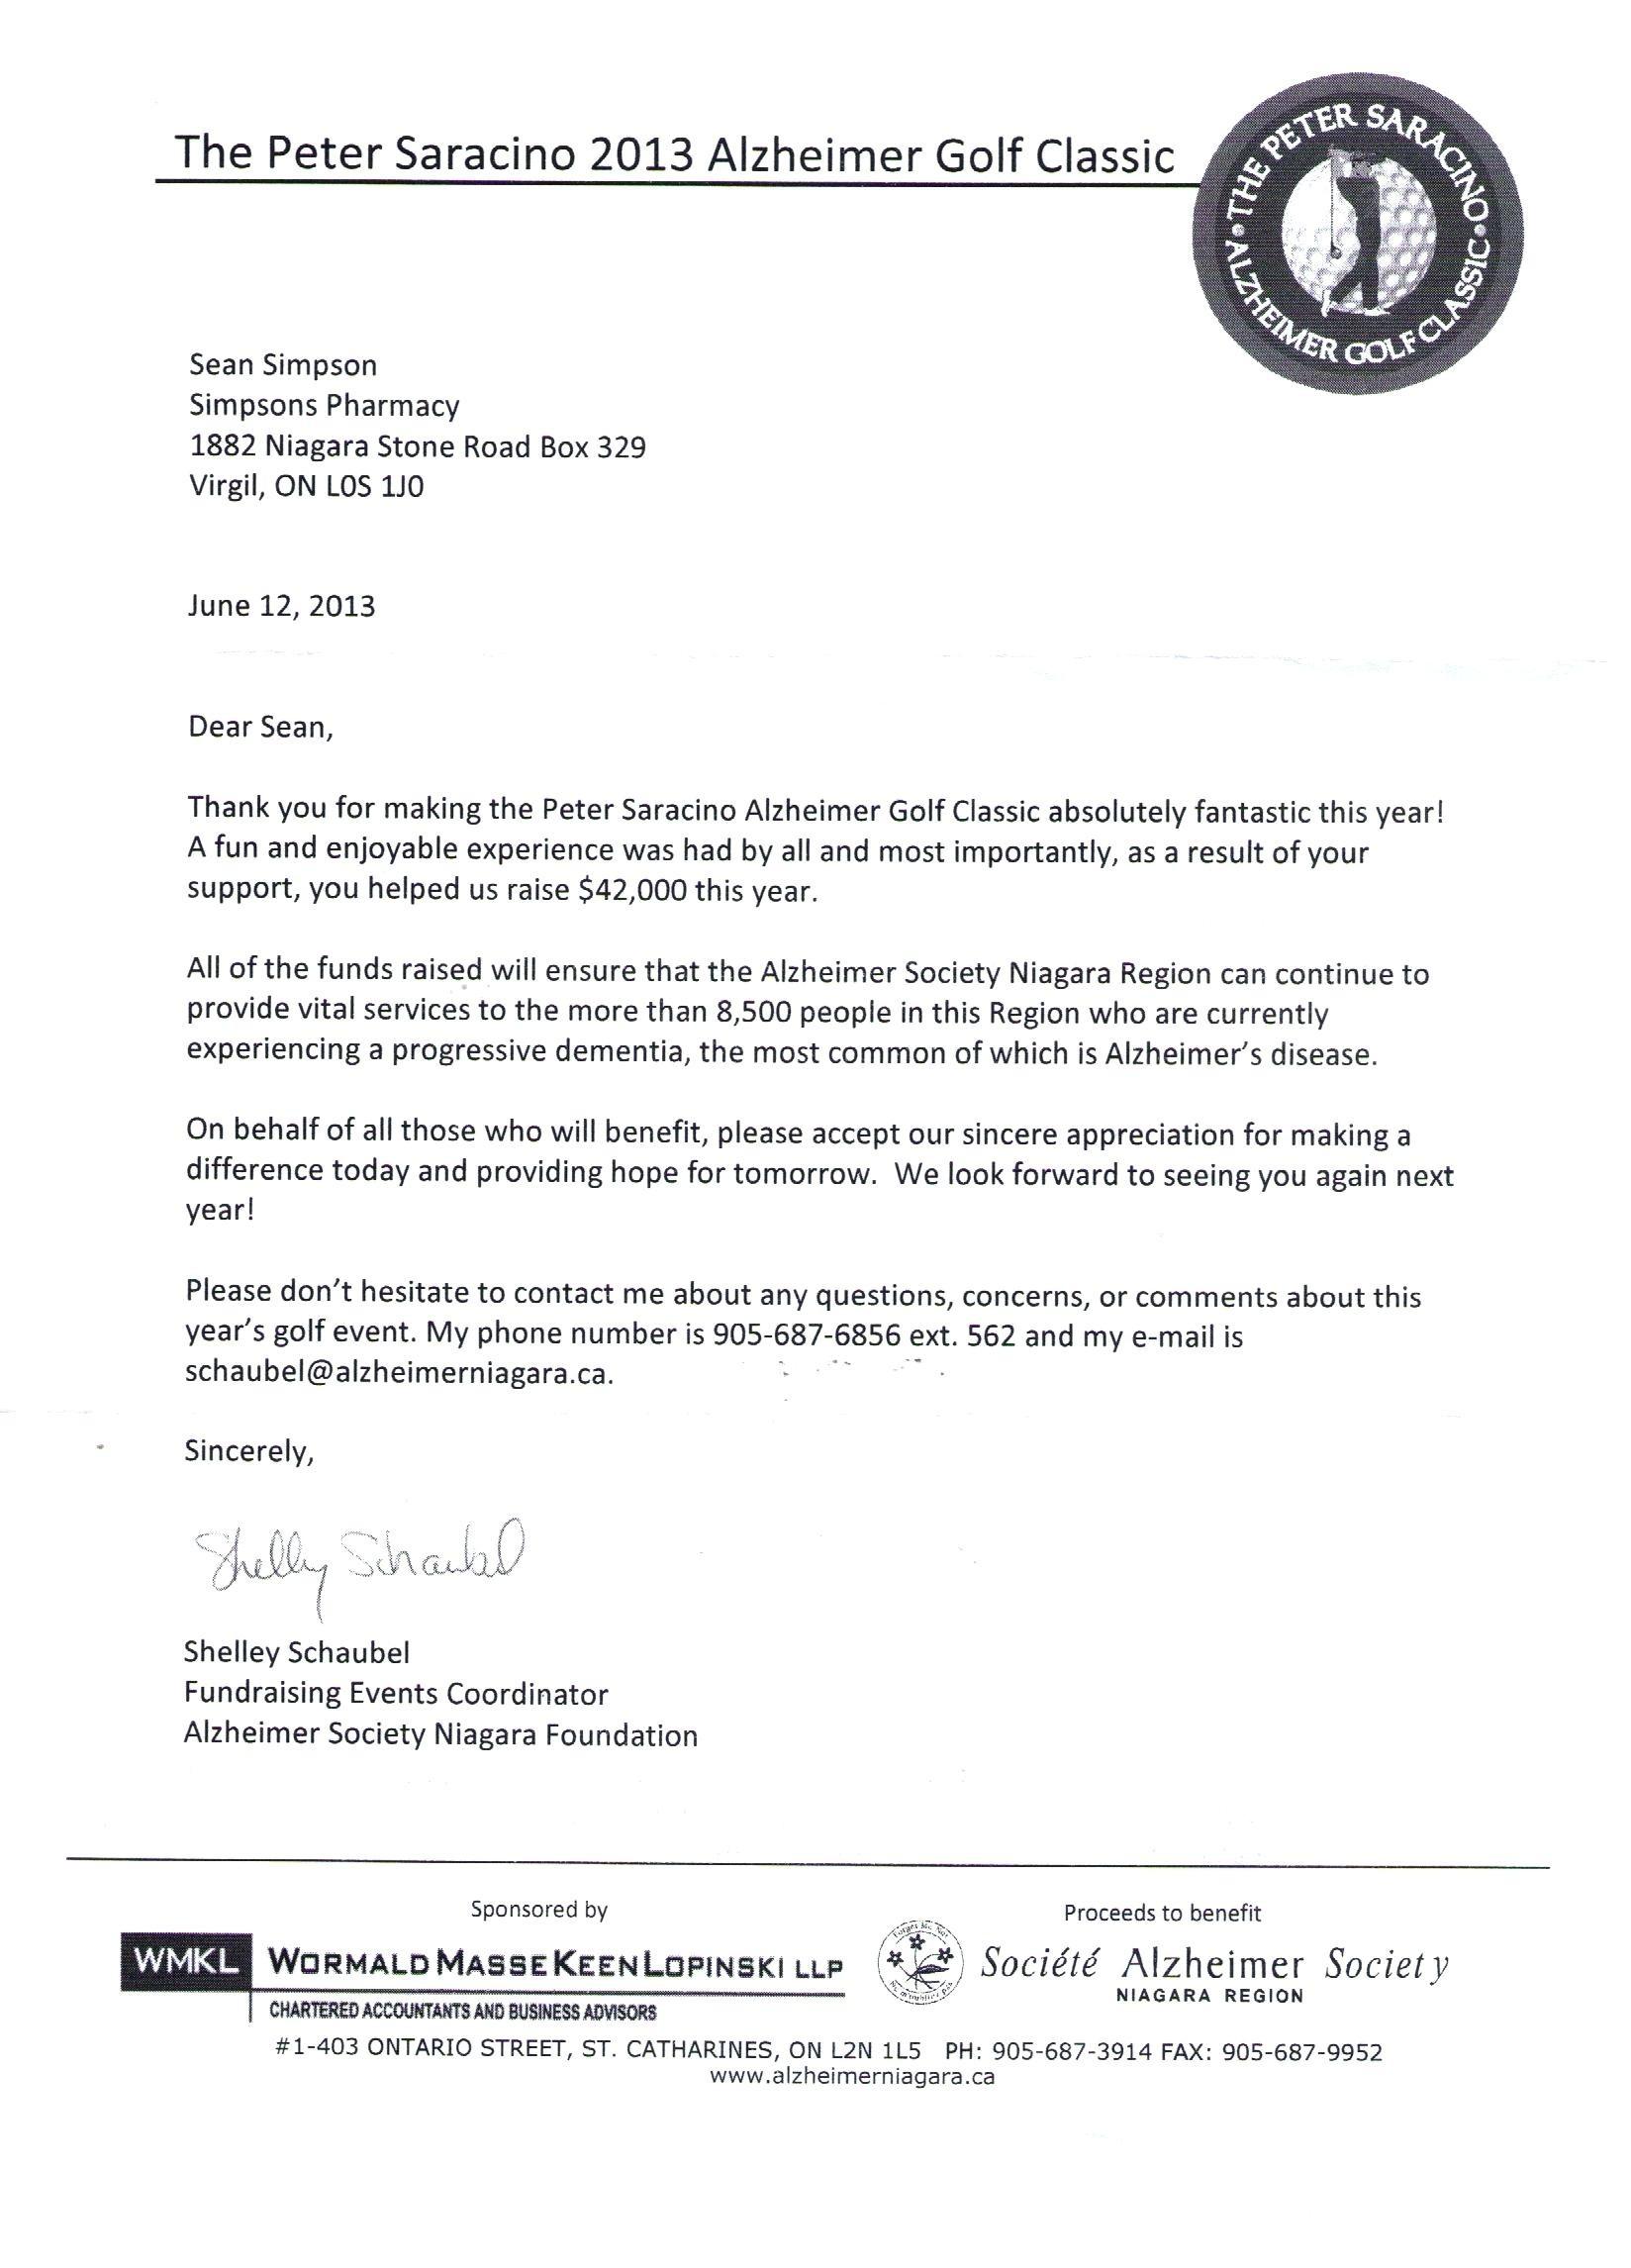 Golf tournament Donation Letter Template - Sponsorship Letter for Sports Refrence Template Sport Sponsorship